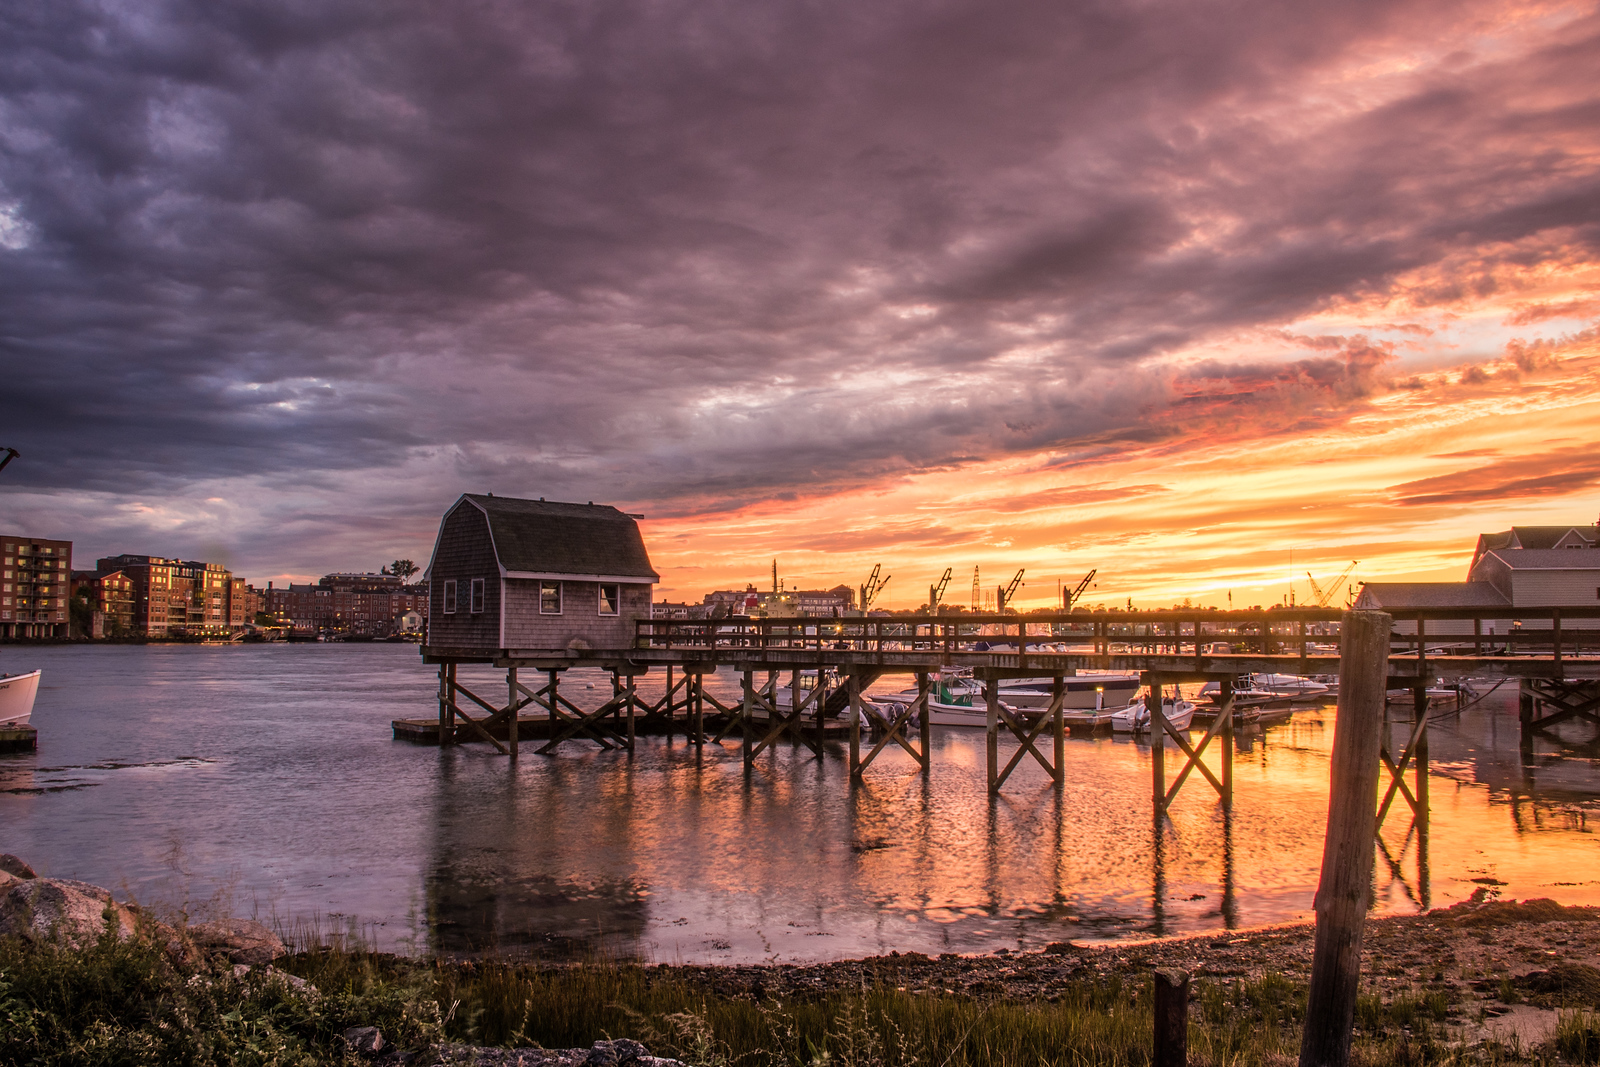 Sunset Badger Island